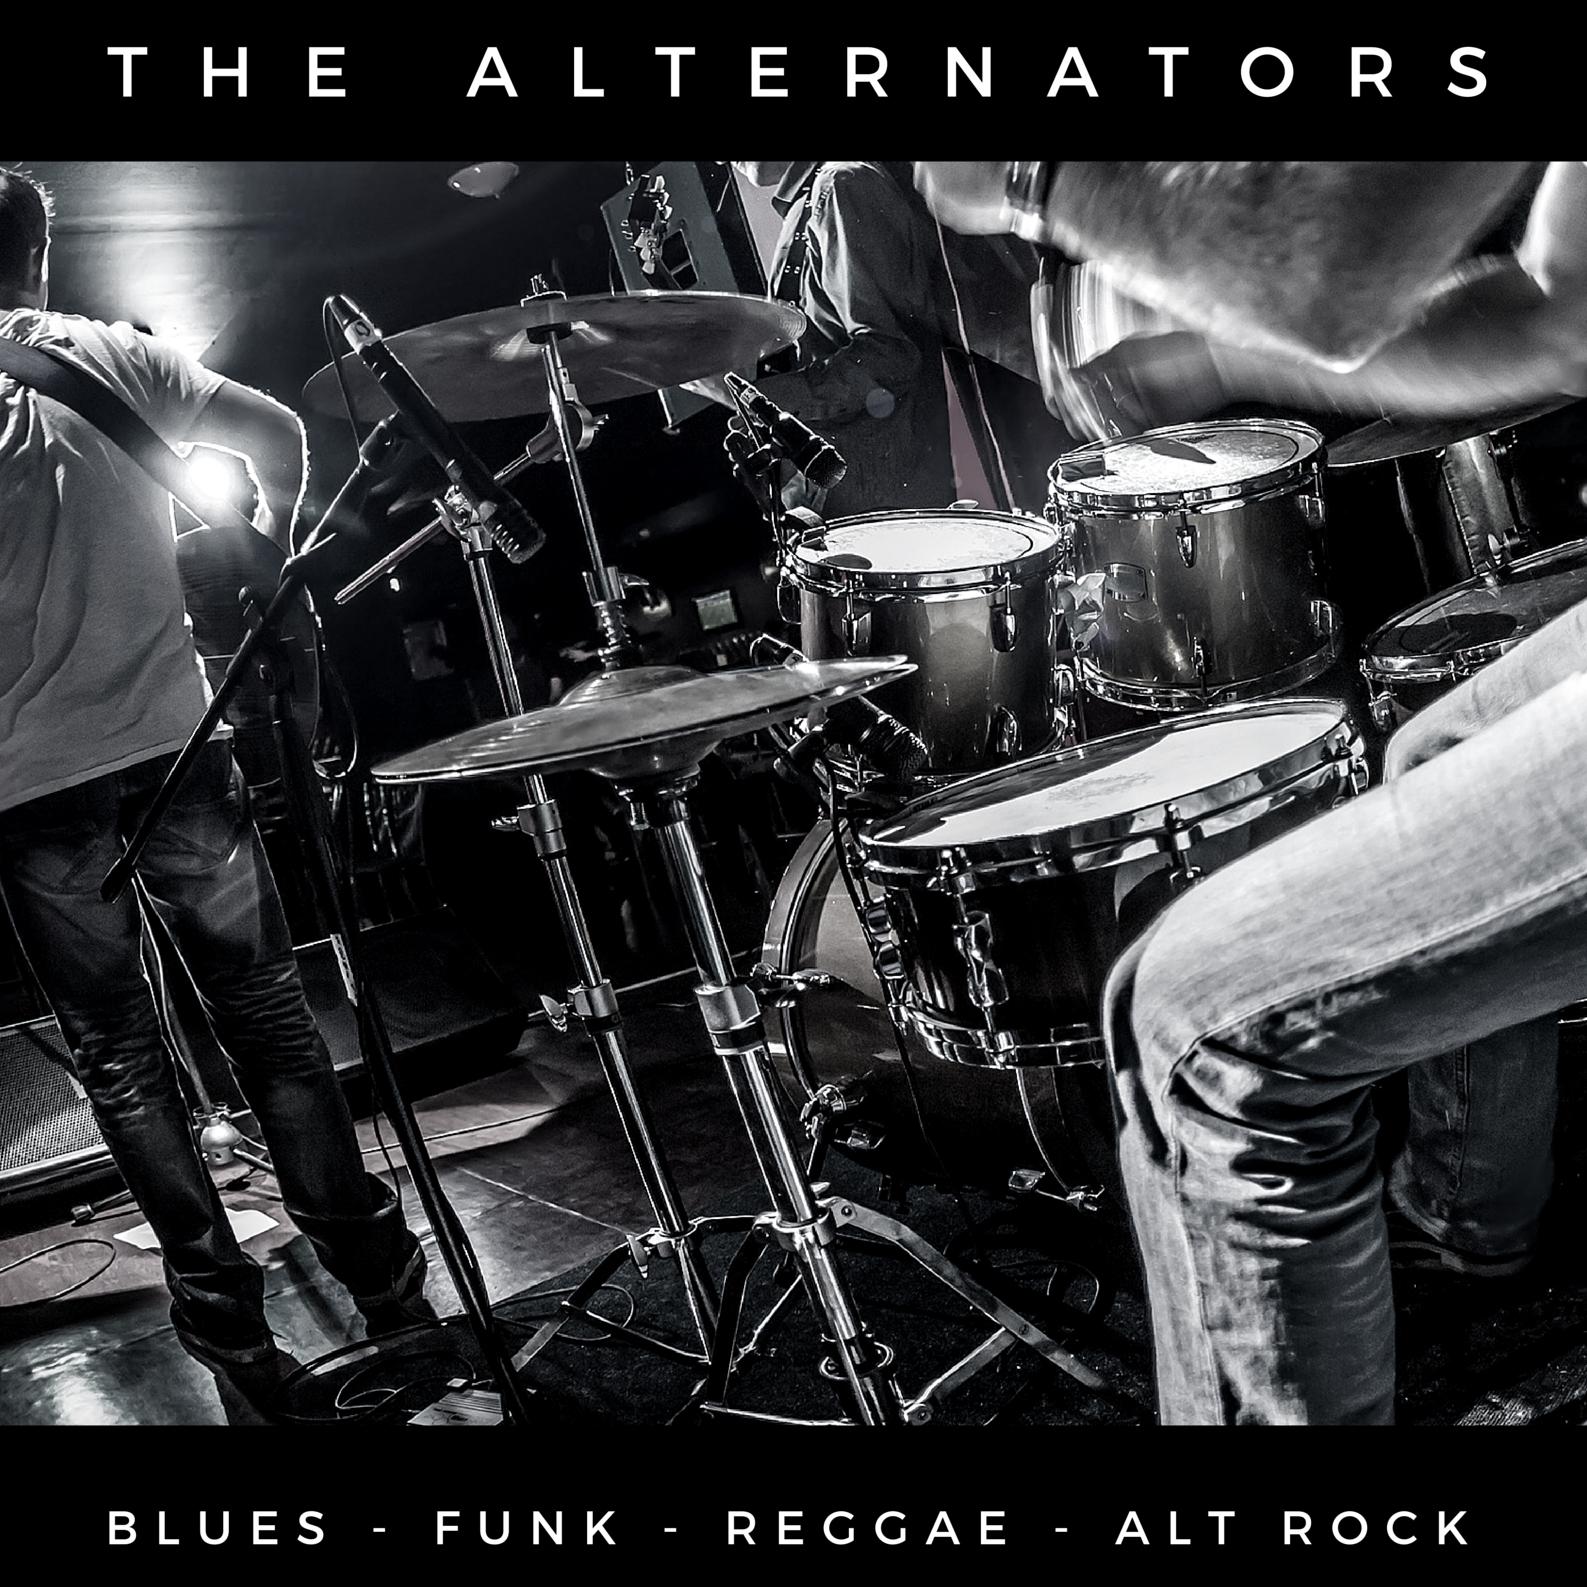 THE ALTERNATORS PRESS PIC.jpg